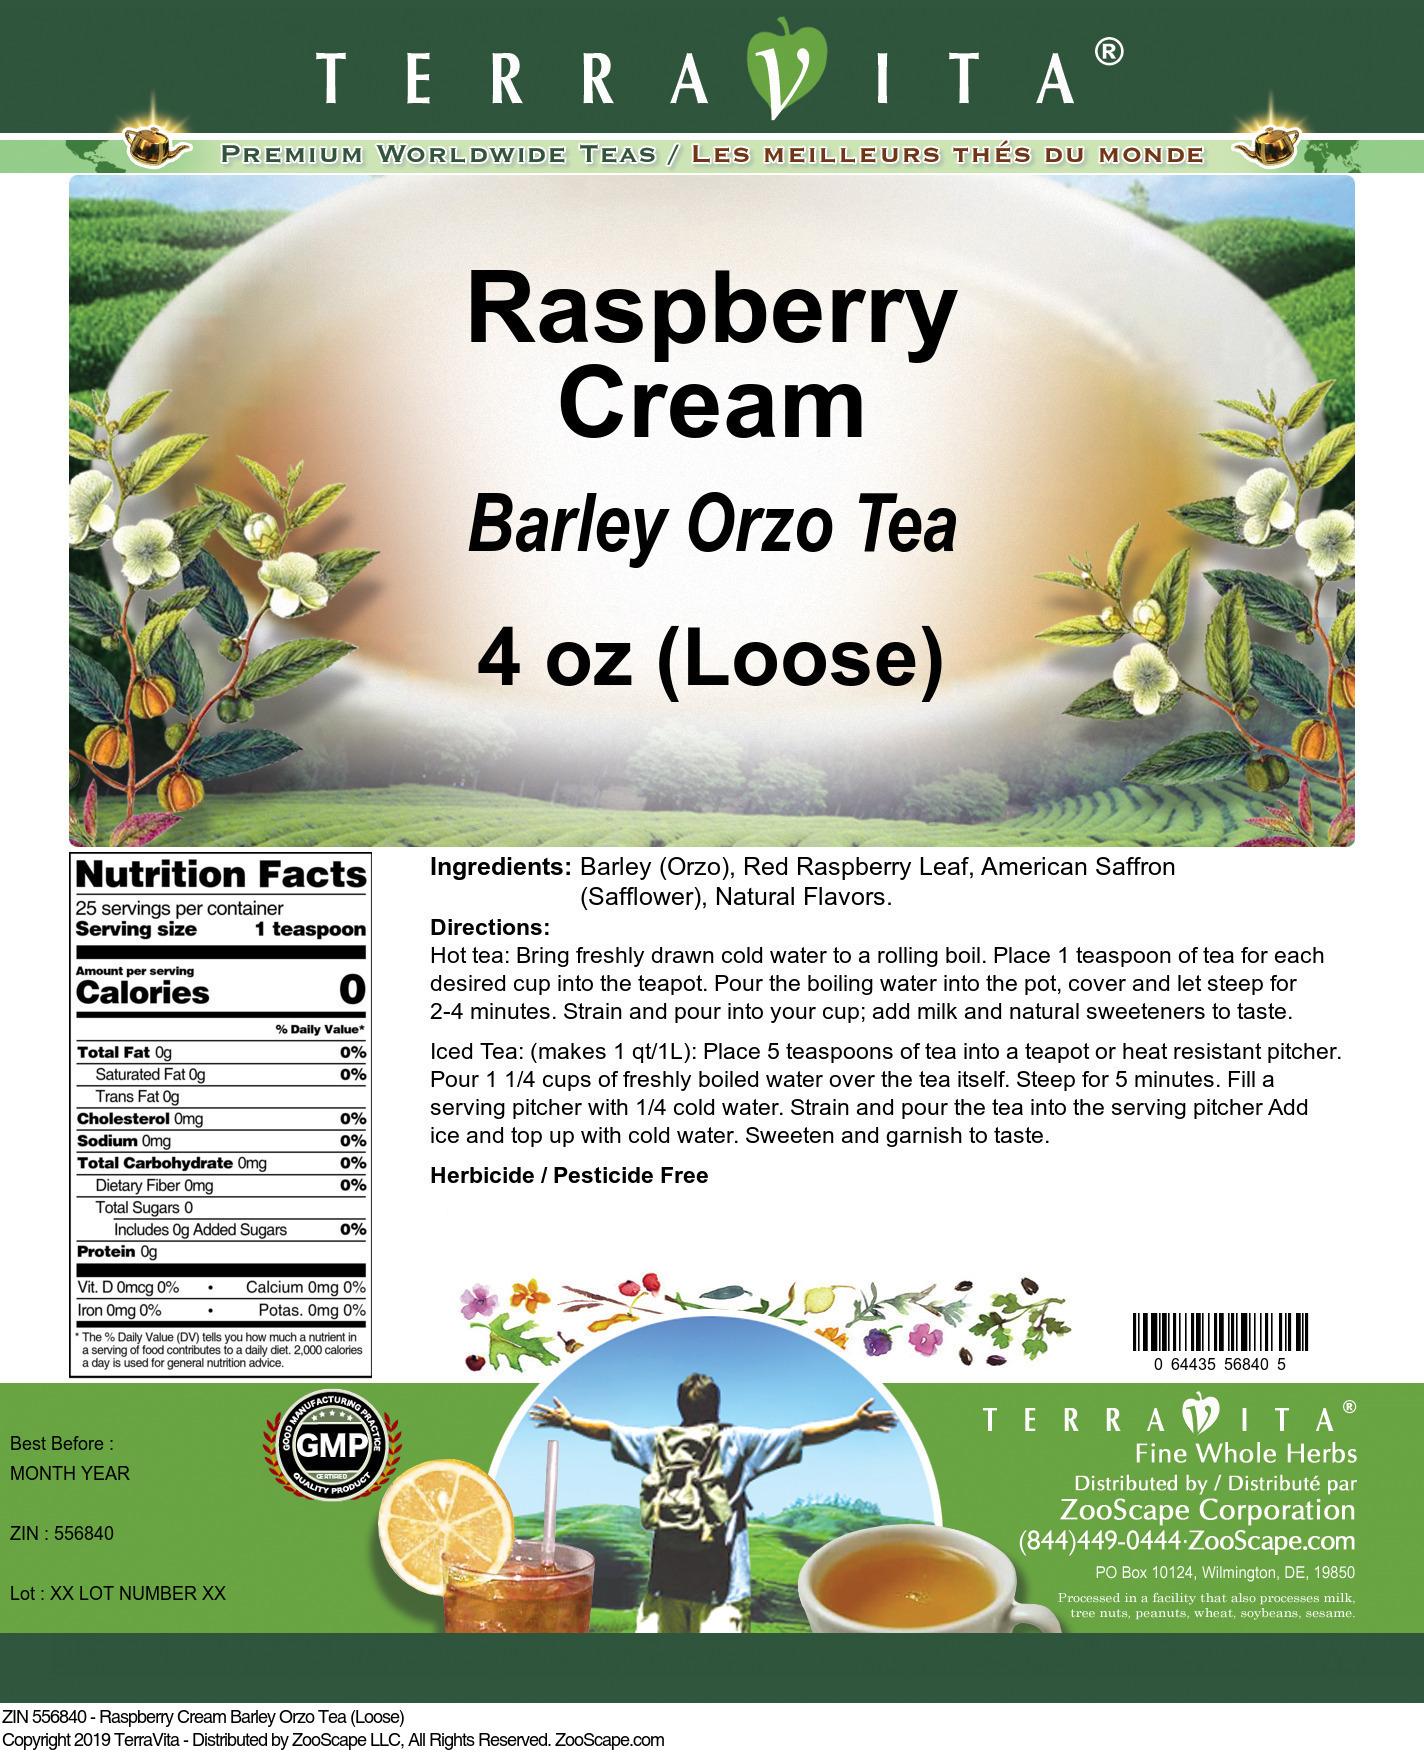 Raspberry Cream Barley Orzo Tea (Loose)